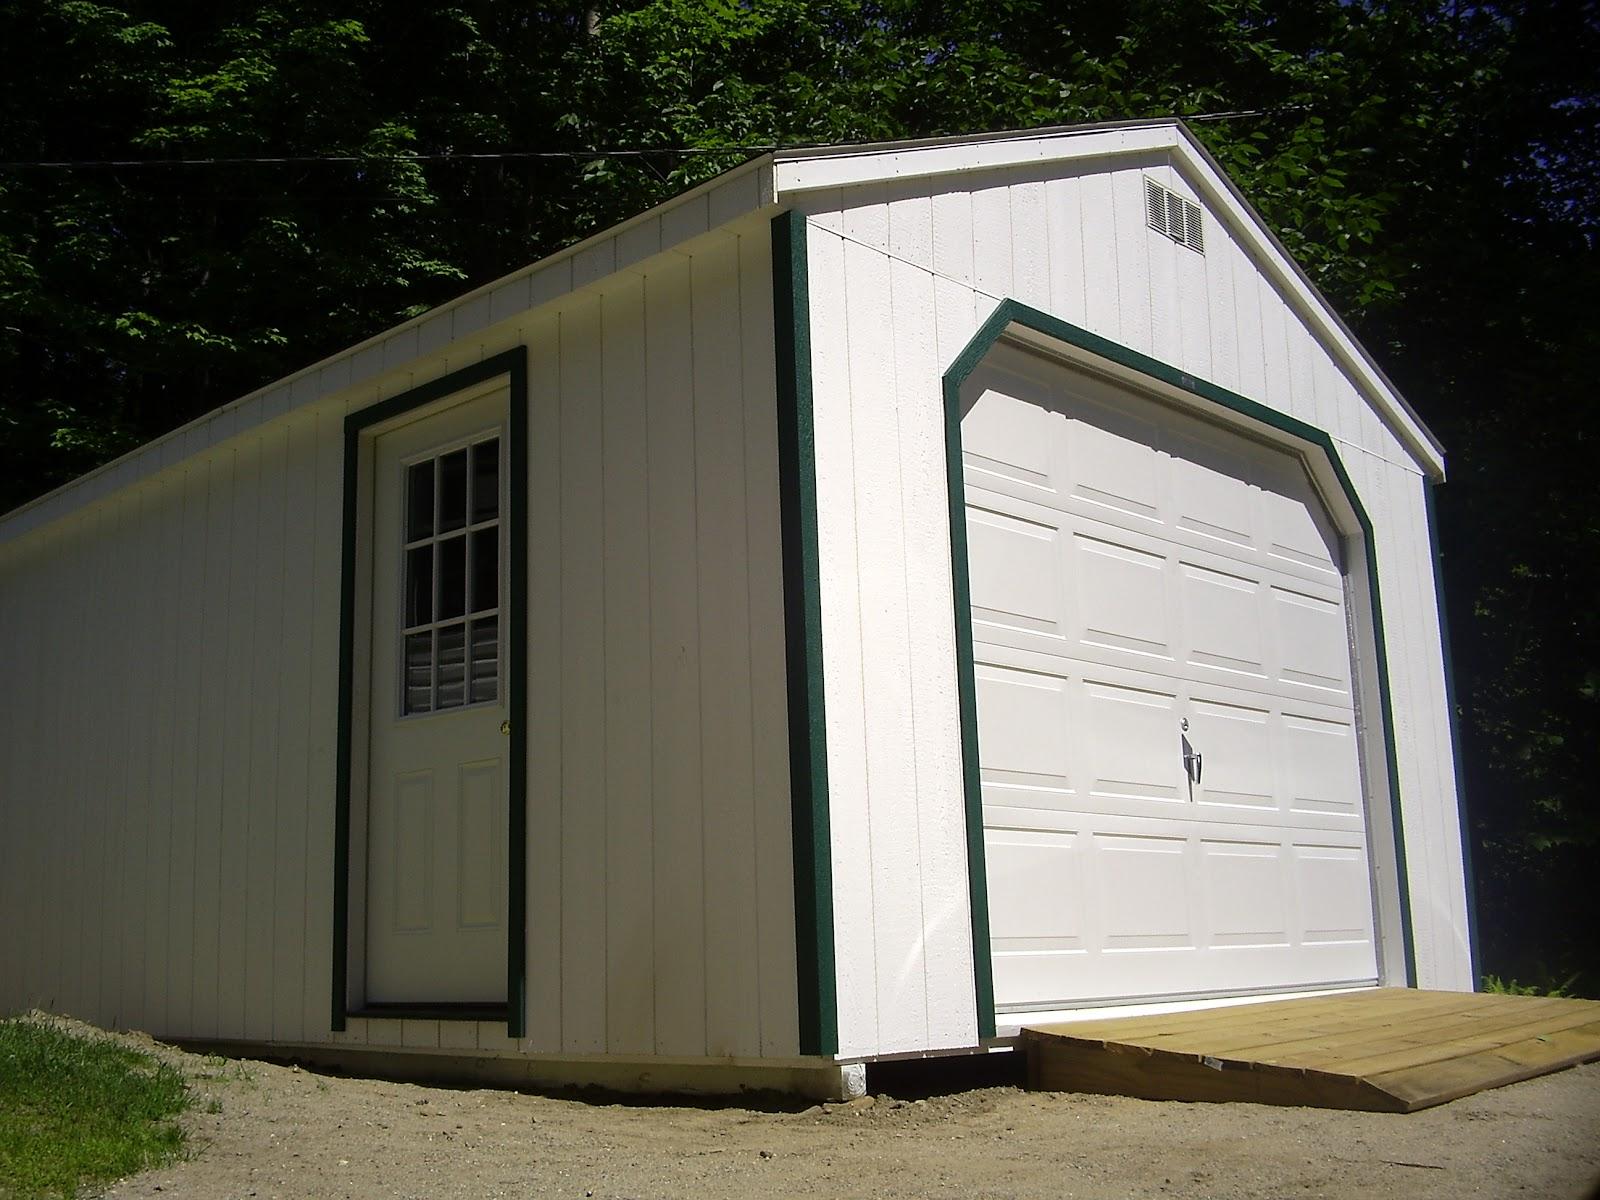 Car_garage_-House_Detached-_July_4th_2008.JPG